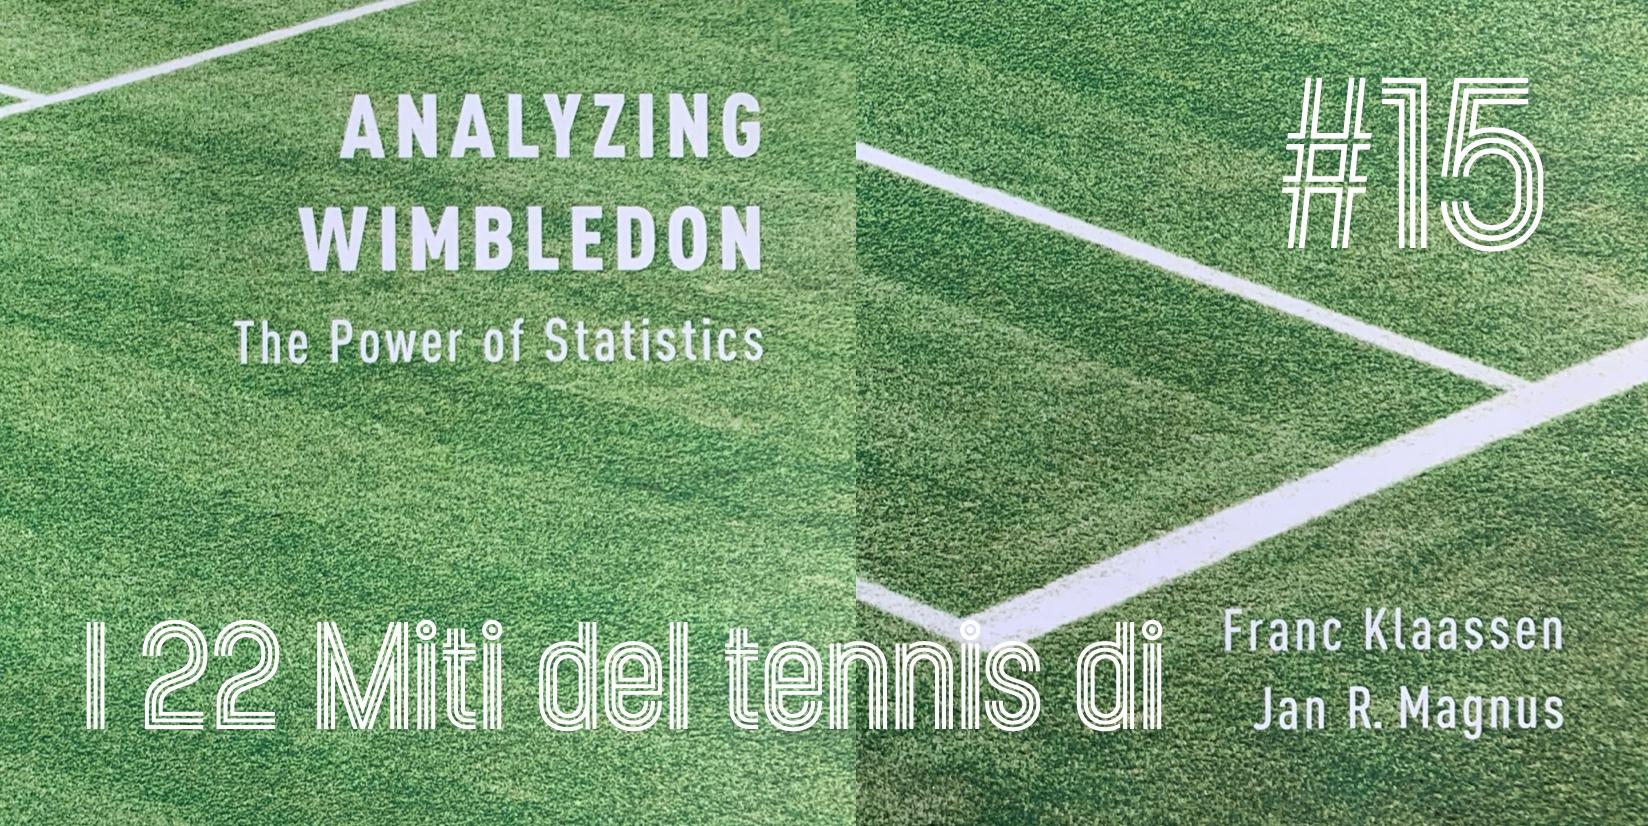 I 22 miti del tennis di Klaassen & Magnus – Mito 15 - settesei.it